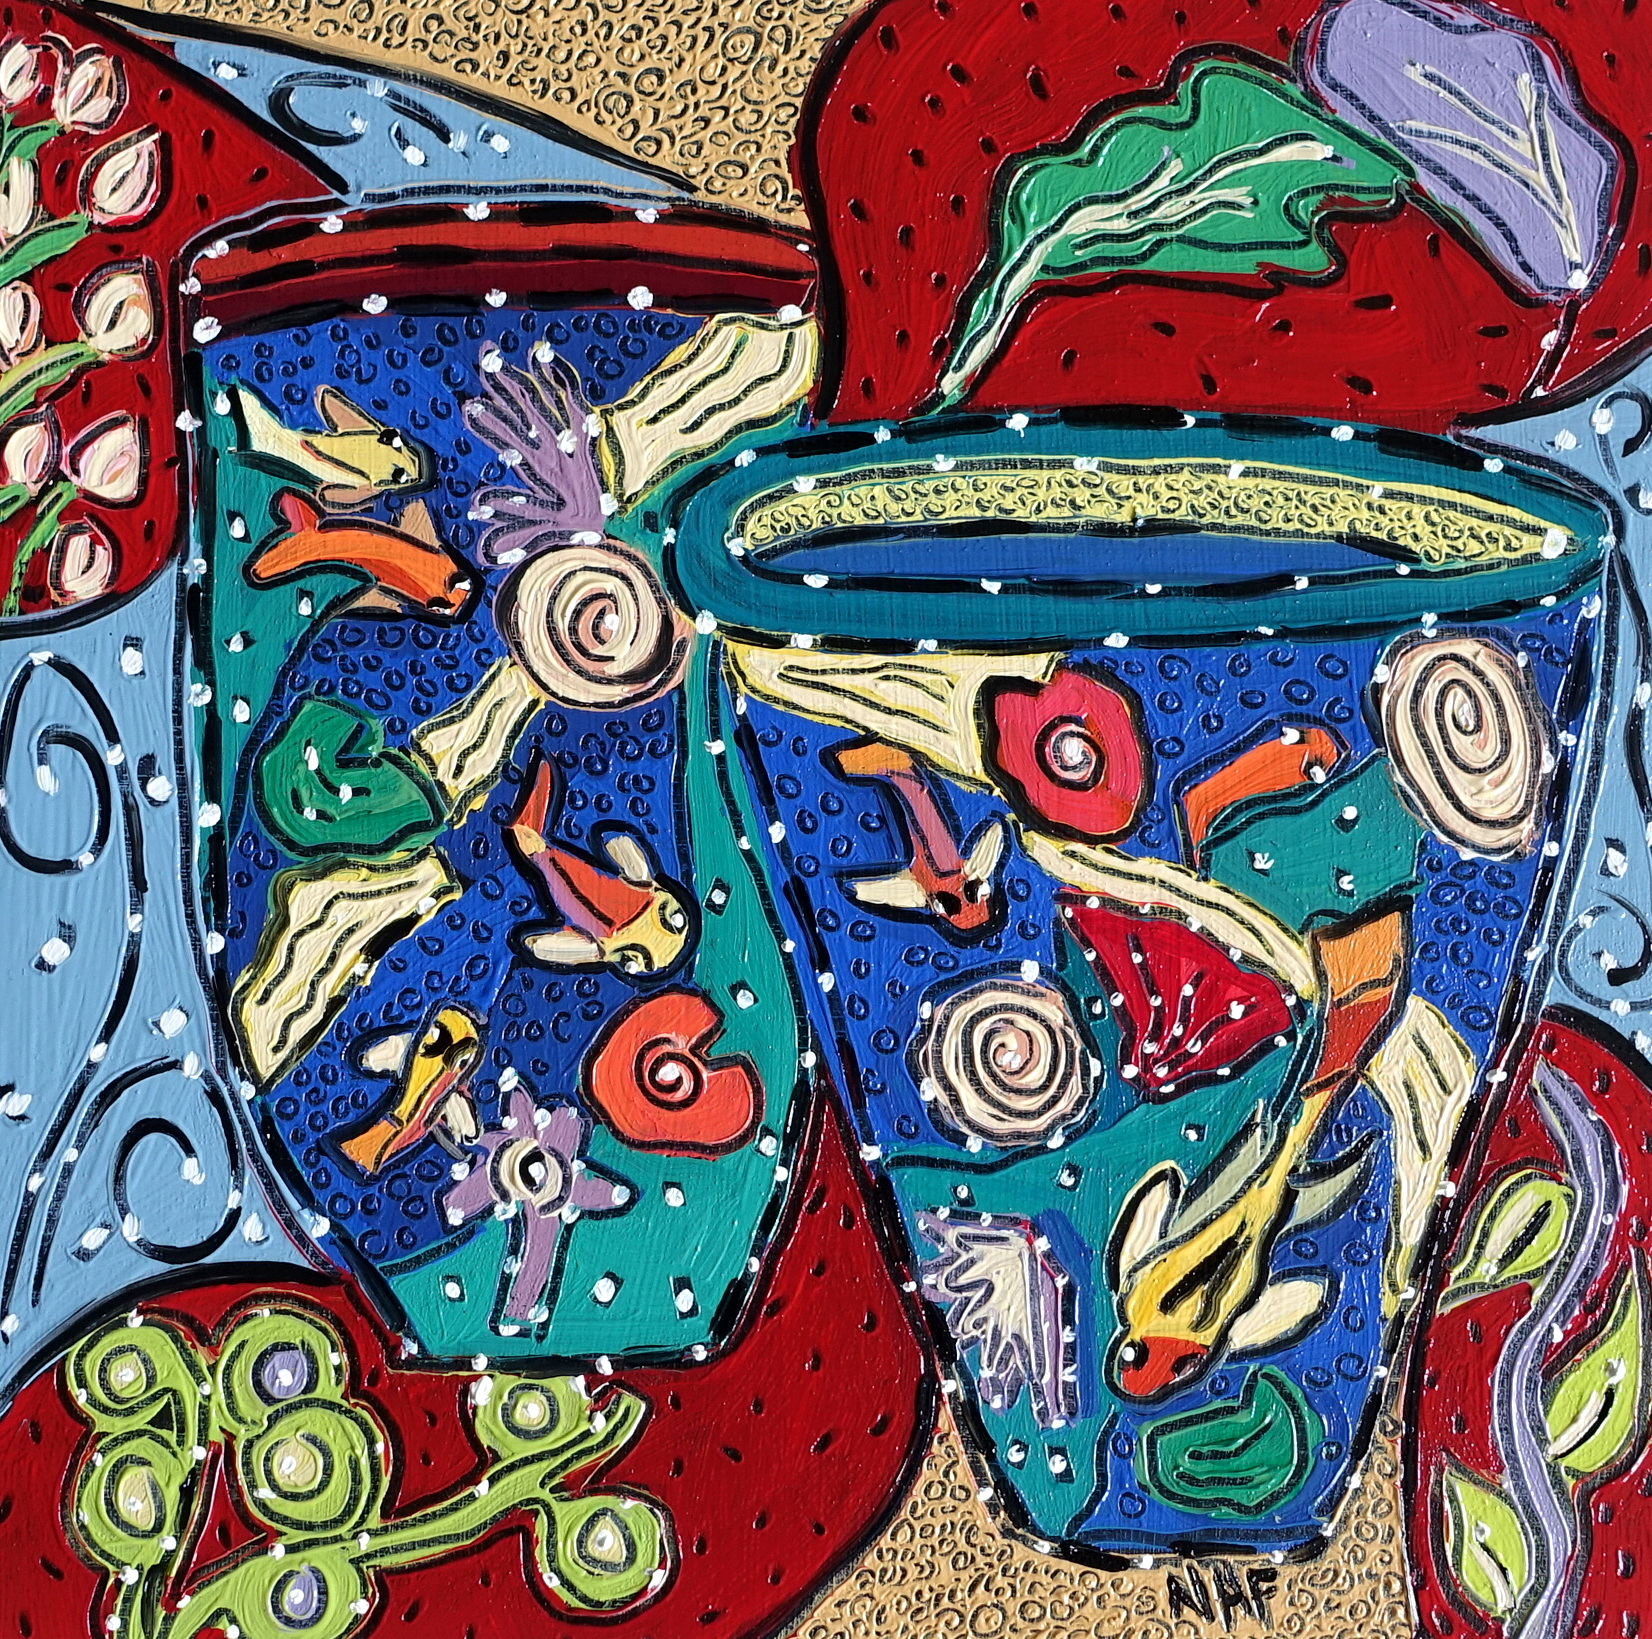 Vessels in Dreamtime 4, oil on panel, 8x8